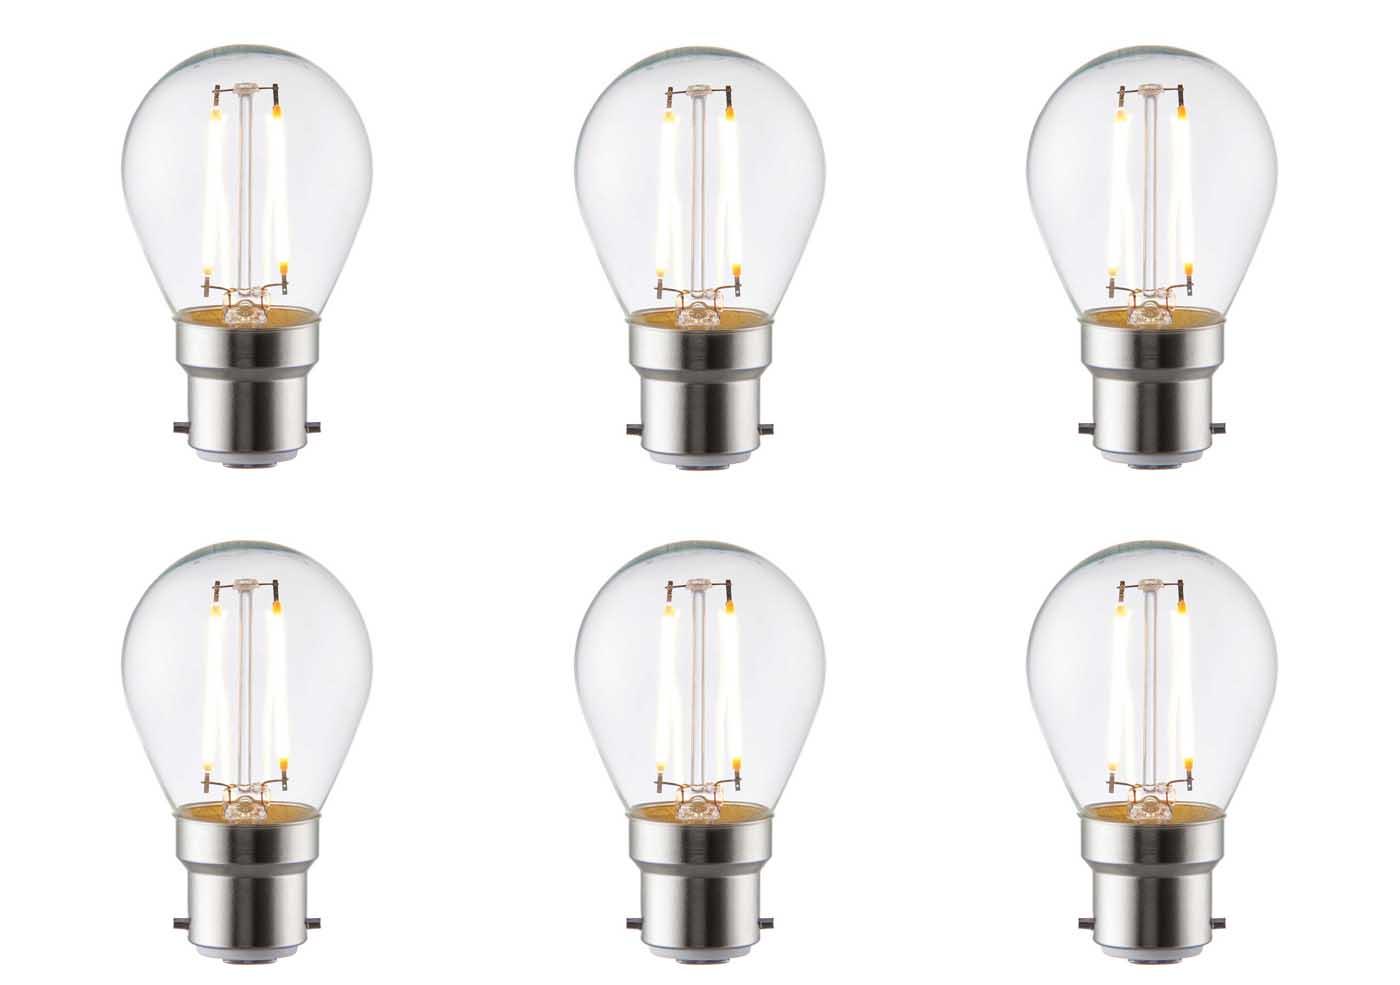 6 X Saxby B22 Led Light Bulb Filament Golf 2 4w Warm White